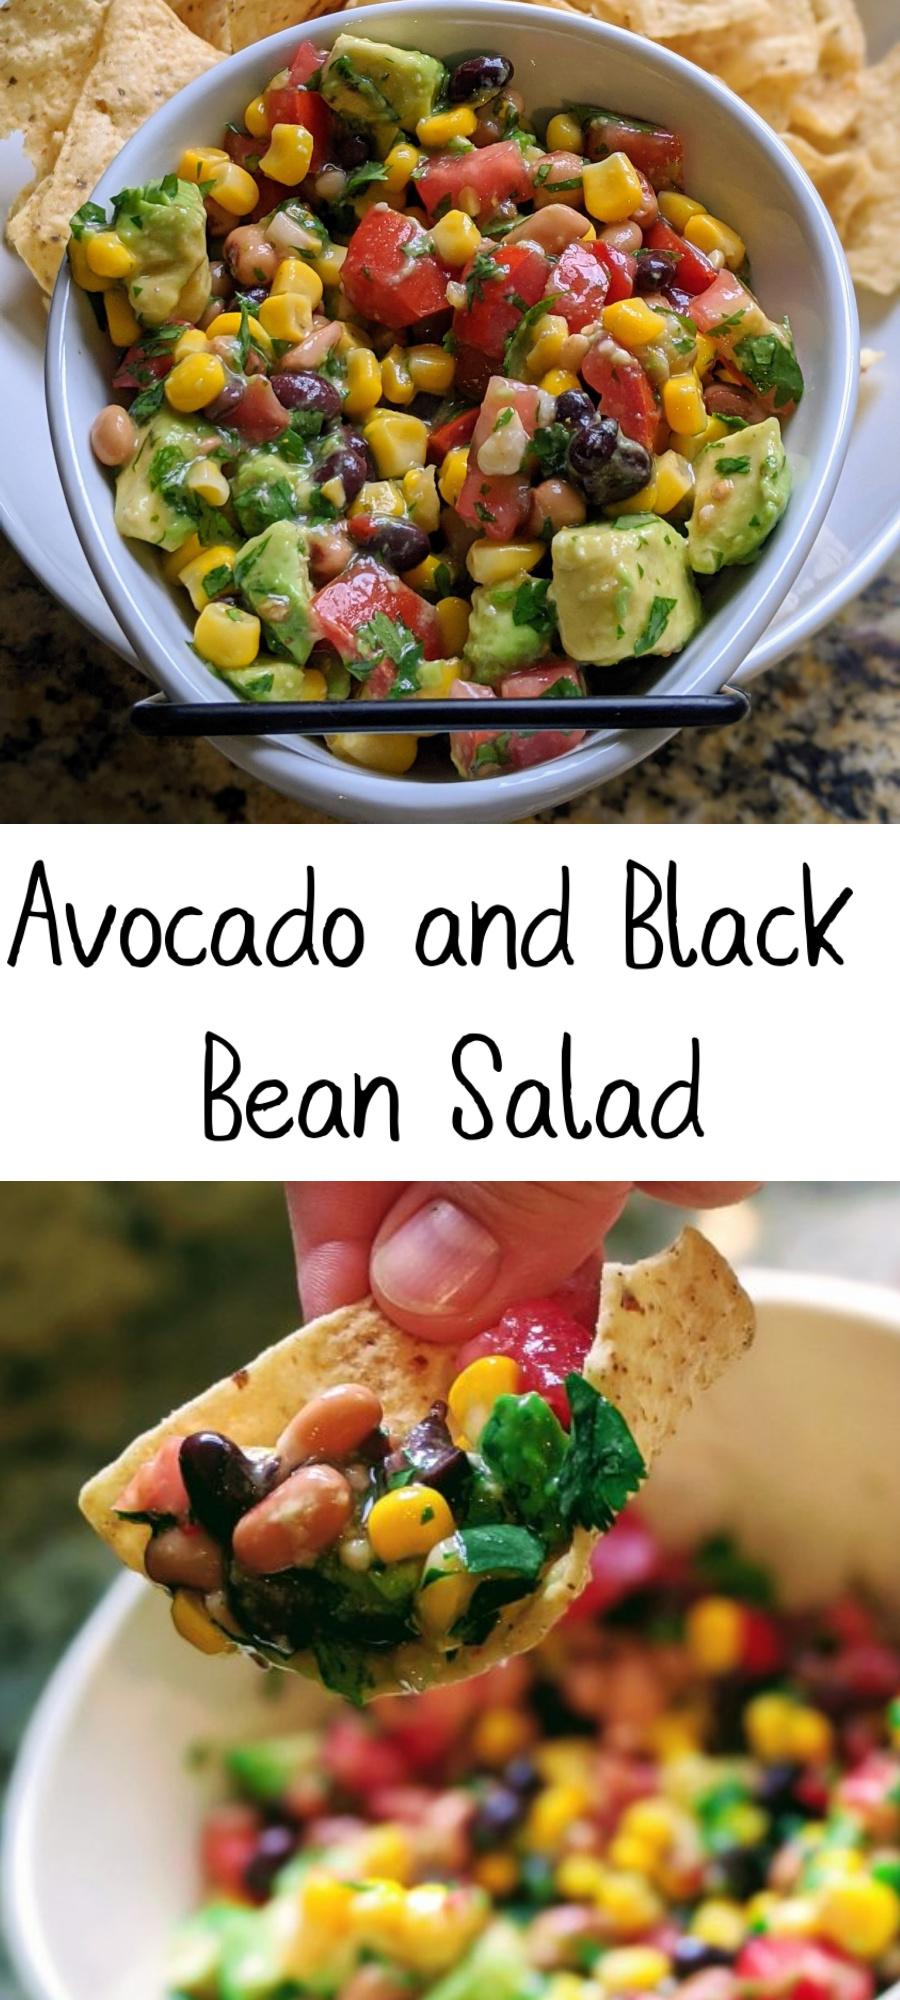 Easy Avocado, Corn, and Black Bean Salad via @simplysidedishes89